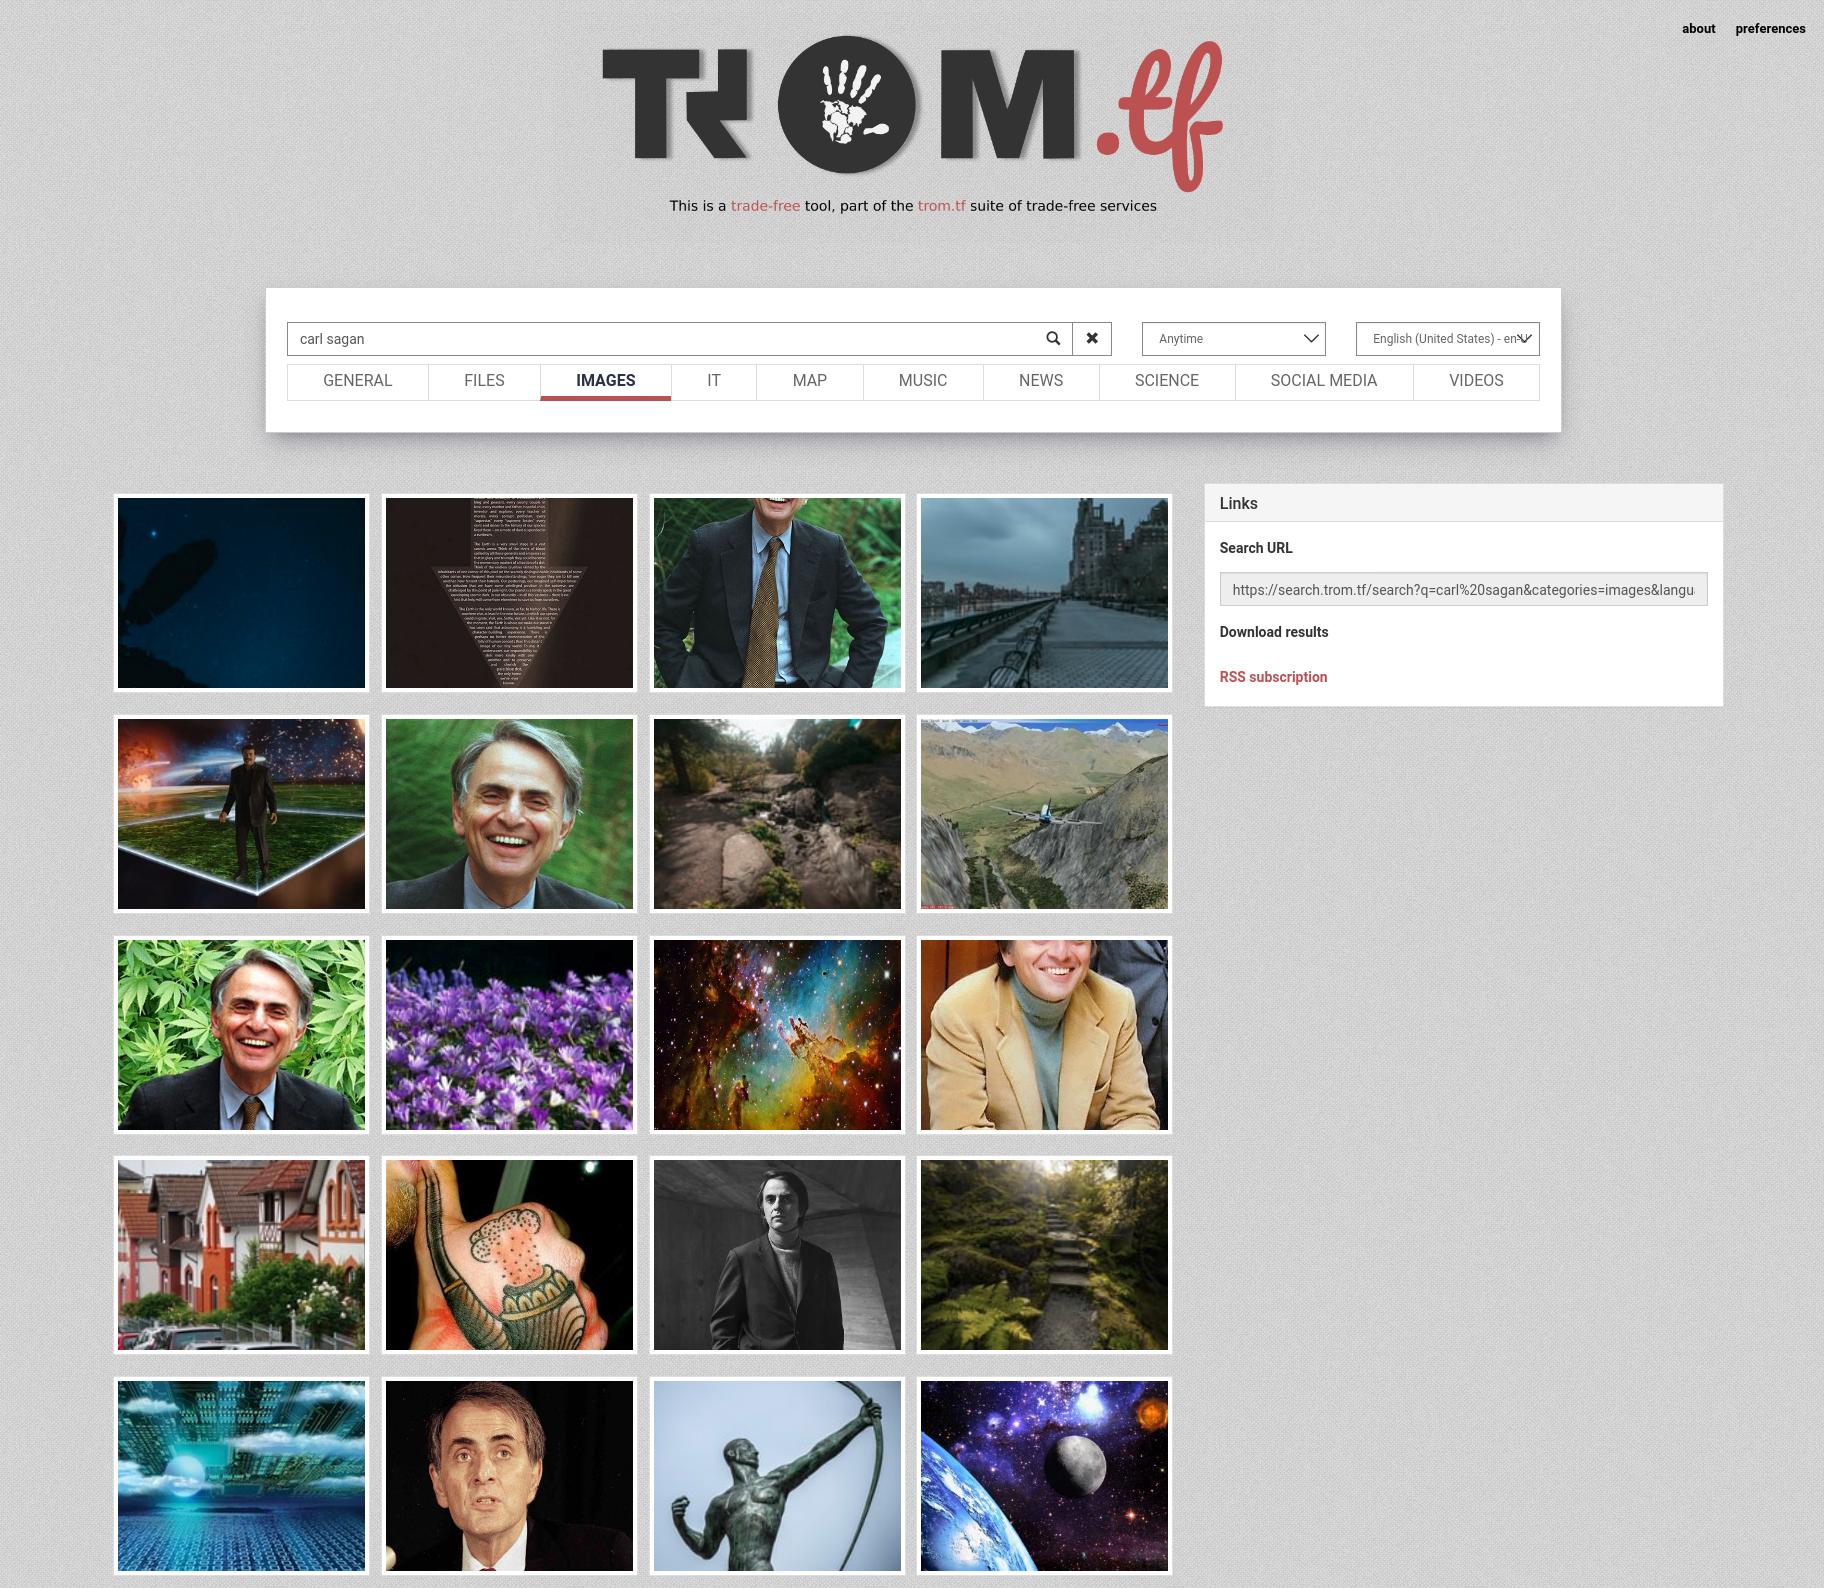 Screenshot_2021-03-08 carl sagan - search trom tf(1)